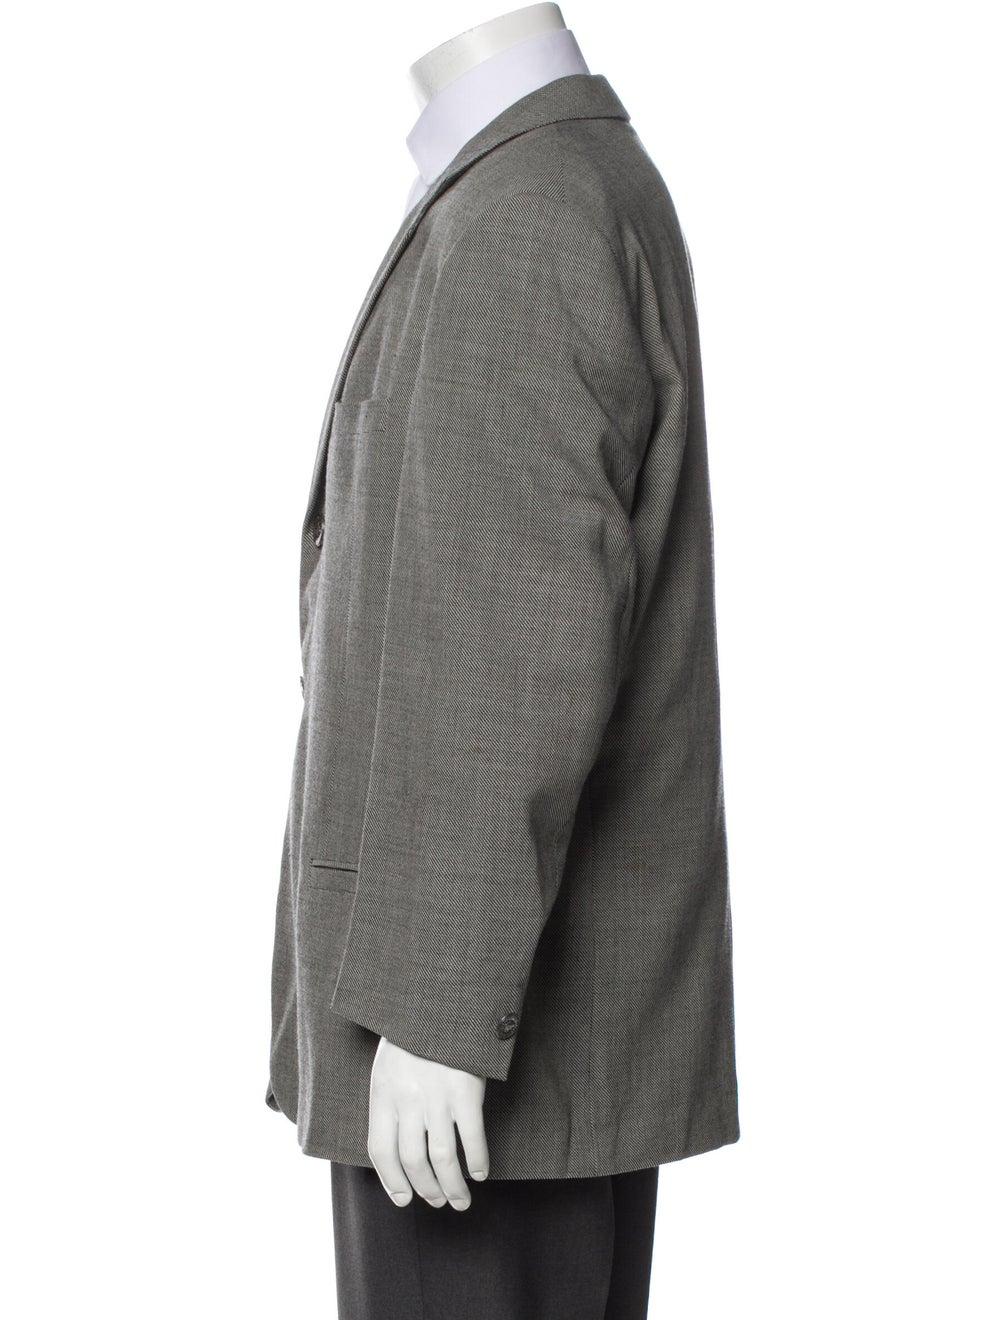 Gianni Versace Wool Two-Piece Blazer Wool - image 2